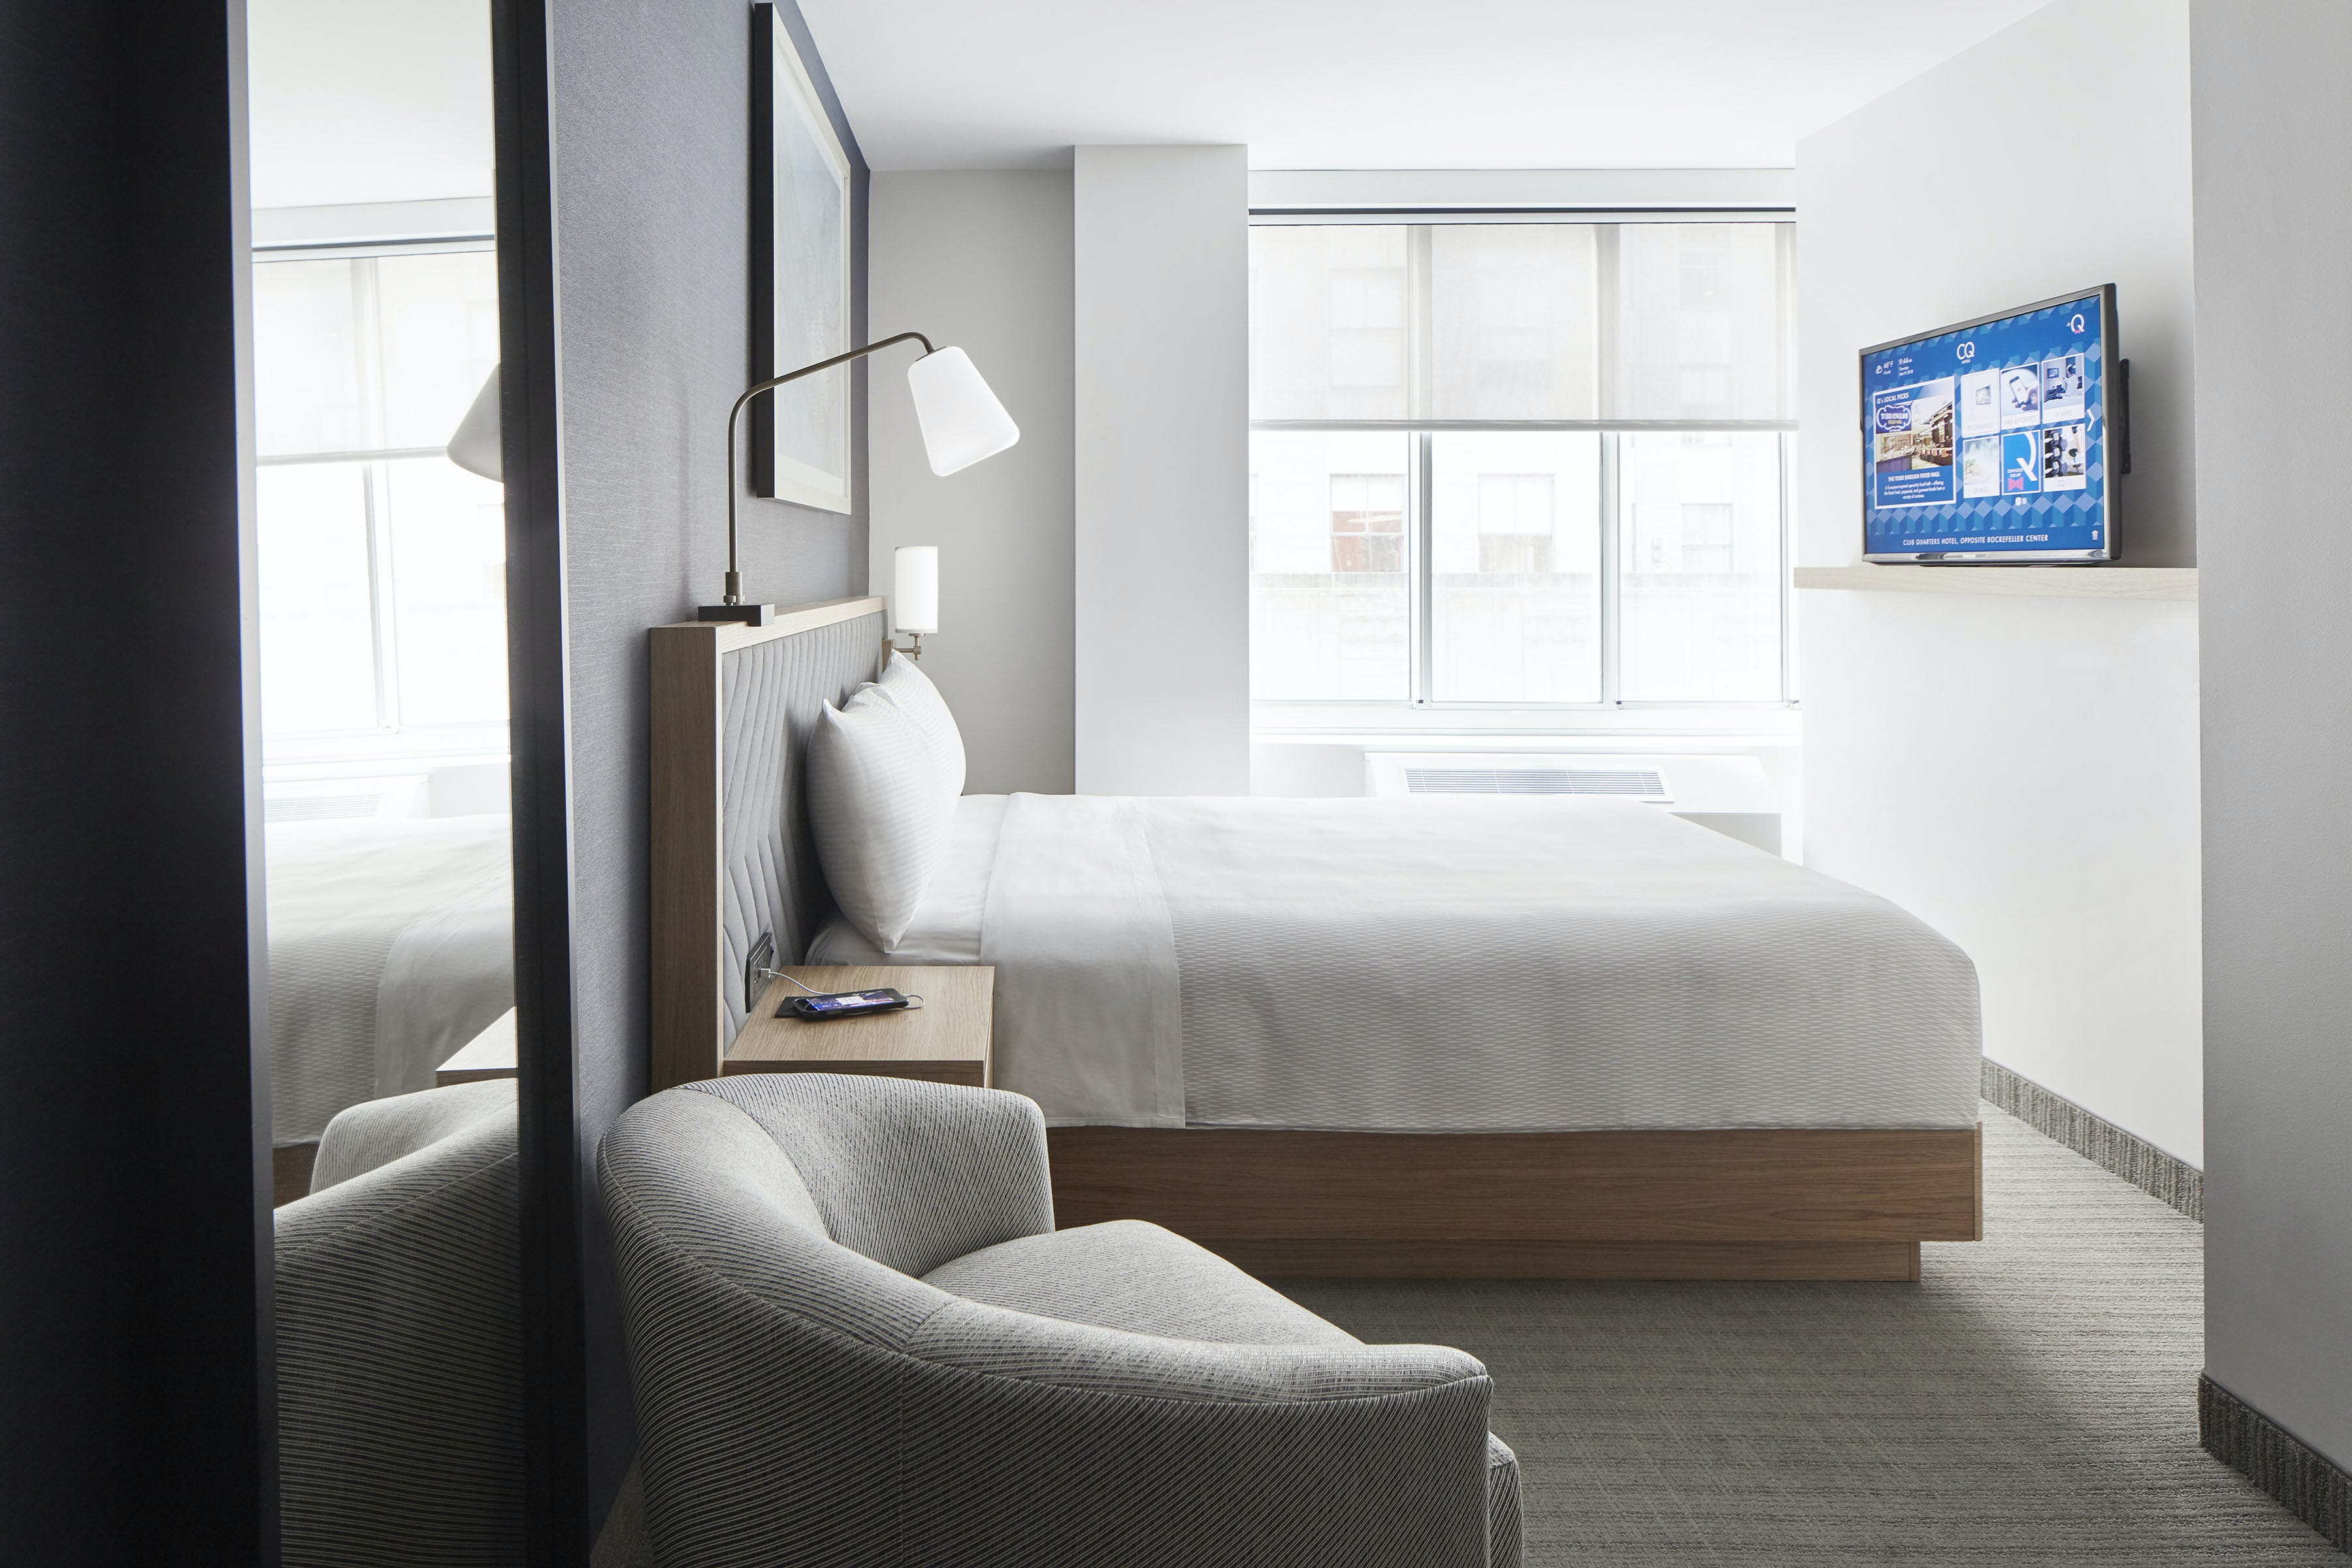 Deluxe Hotel Room Rockefeller Center